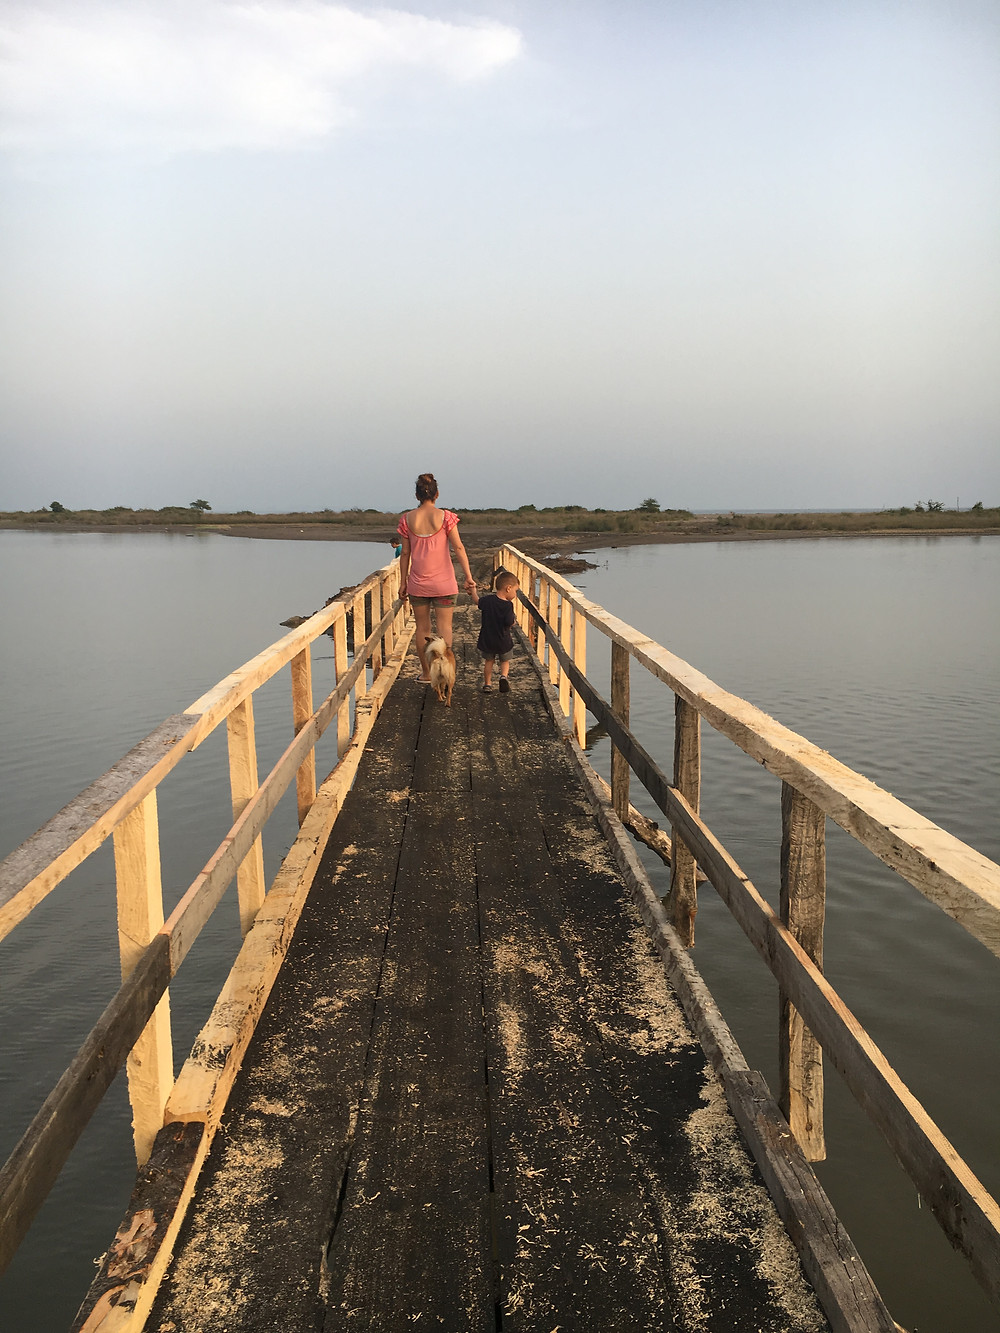 taking a walk down the new bridge to the beach